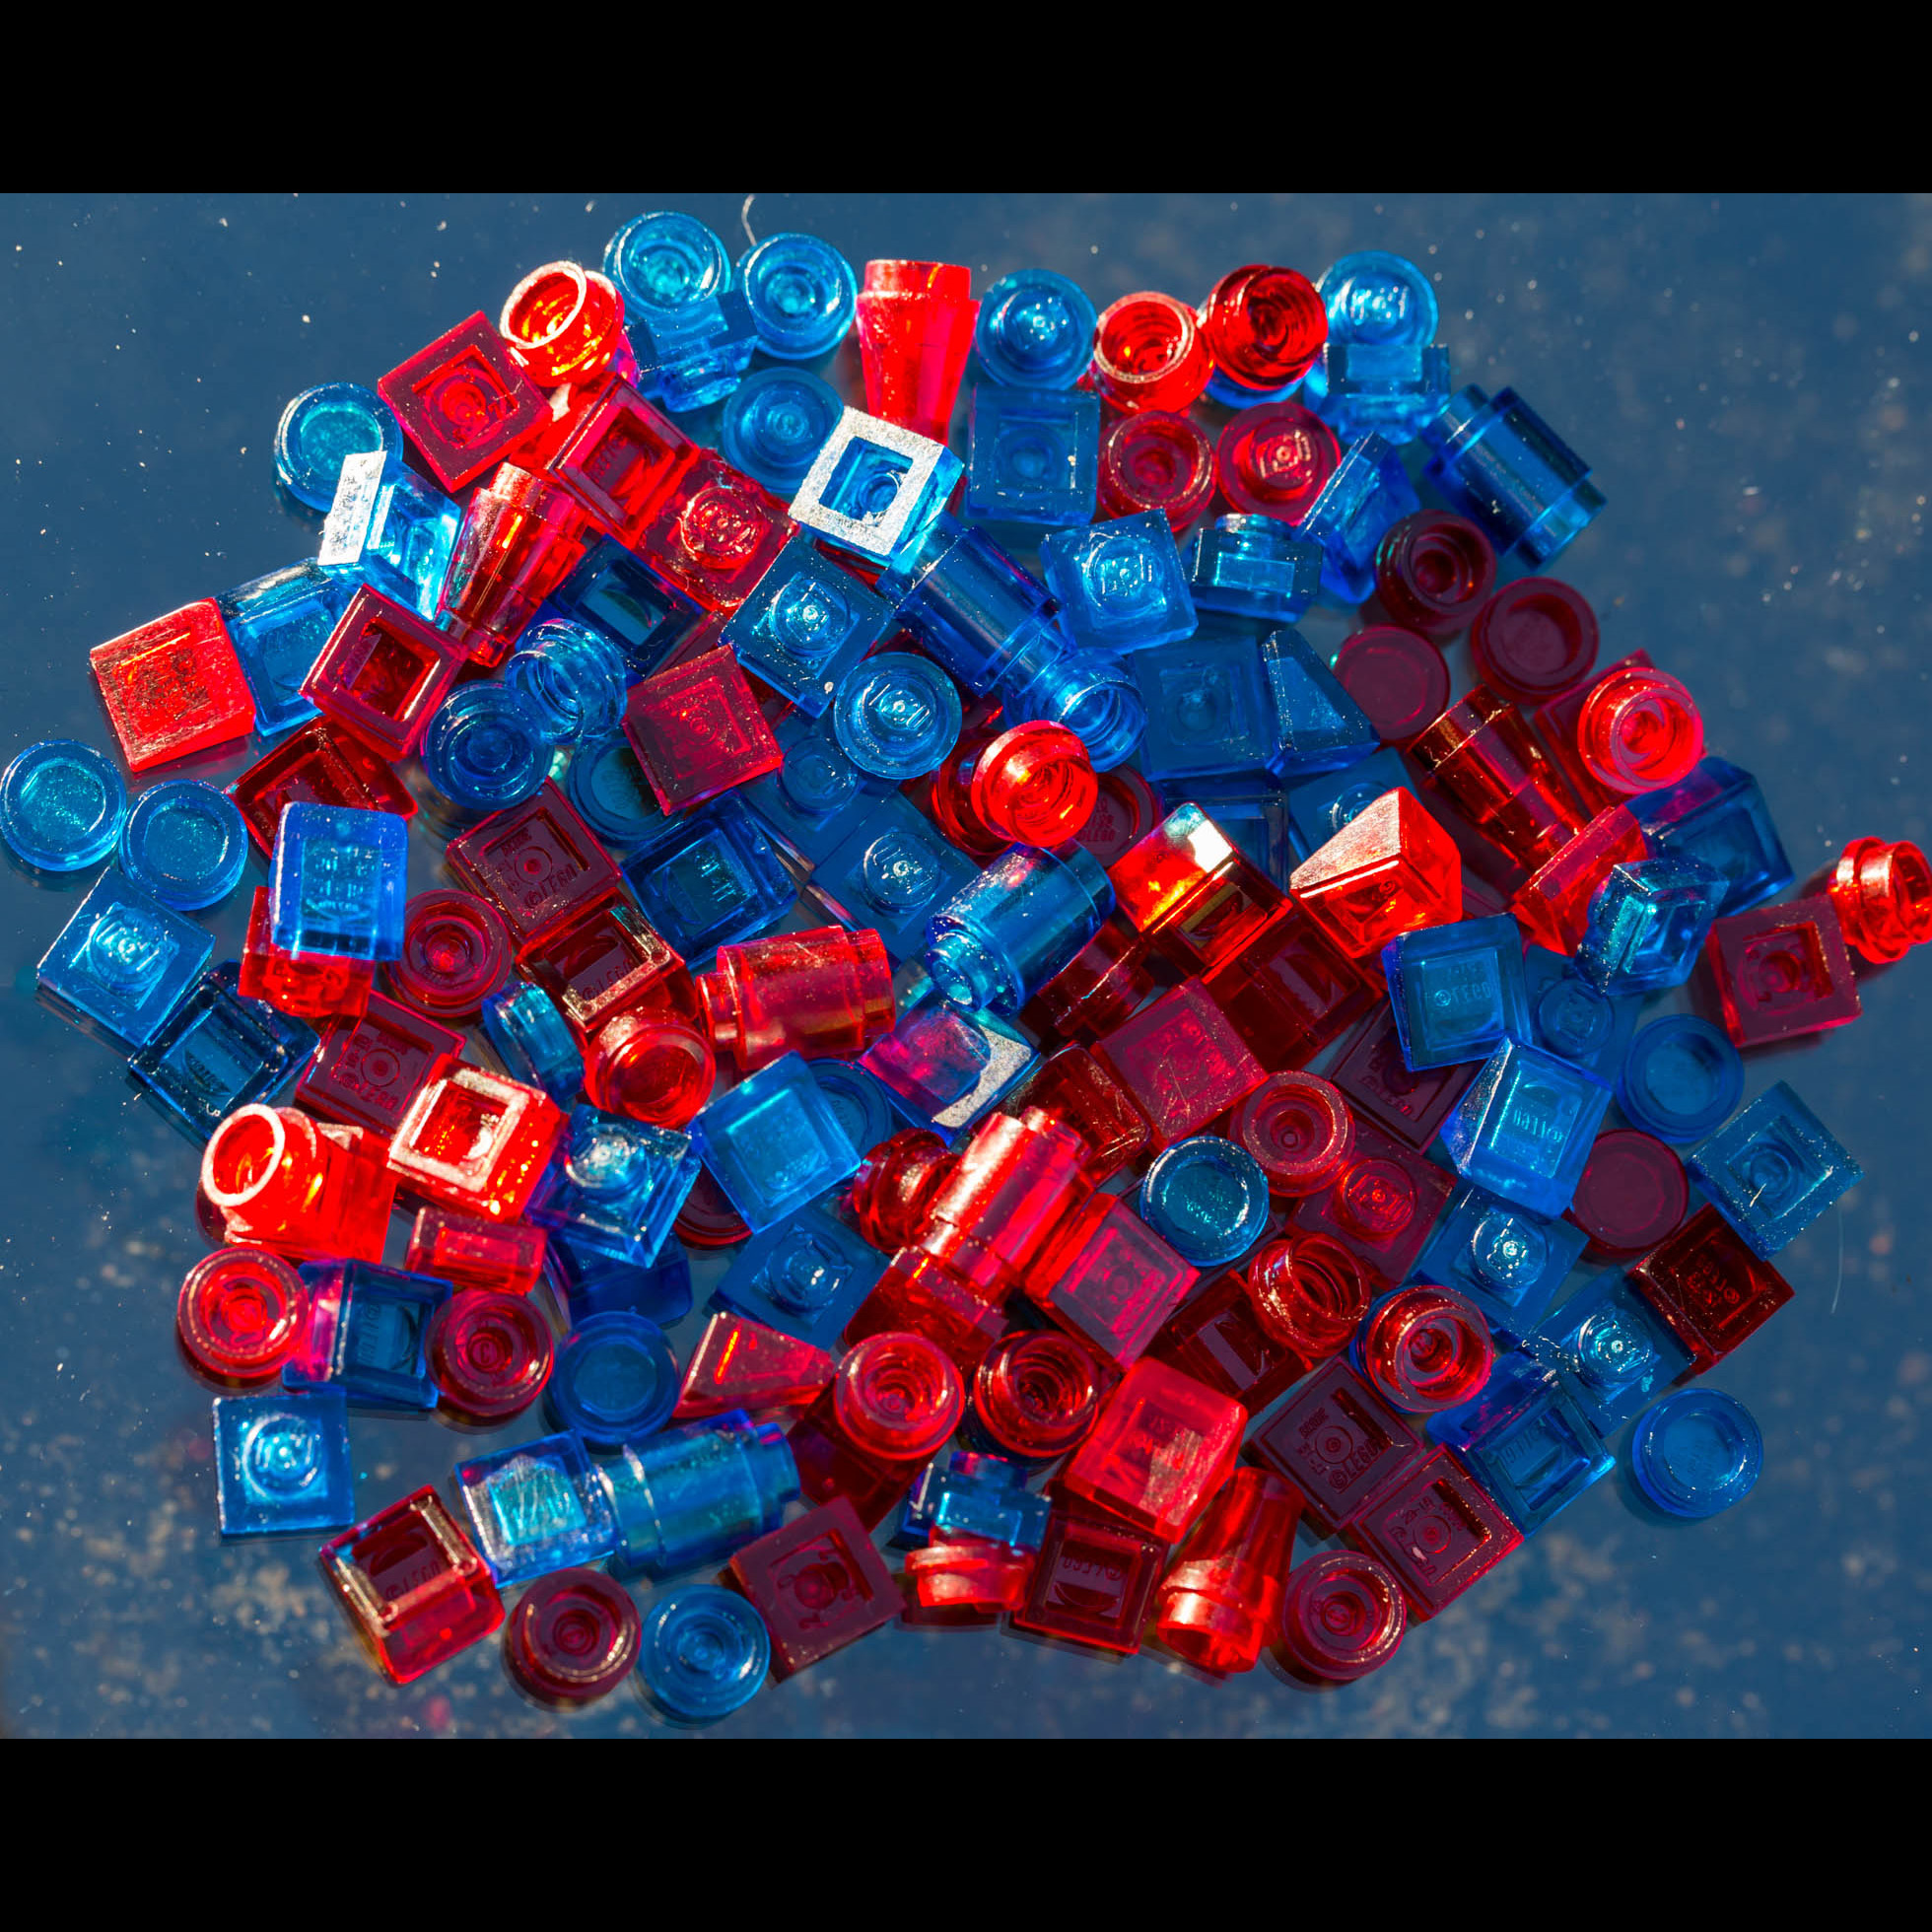 6.24 LEGO LIGHTS